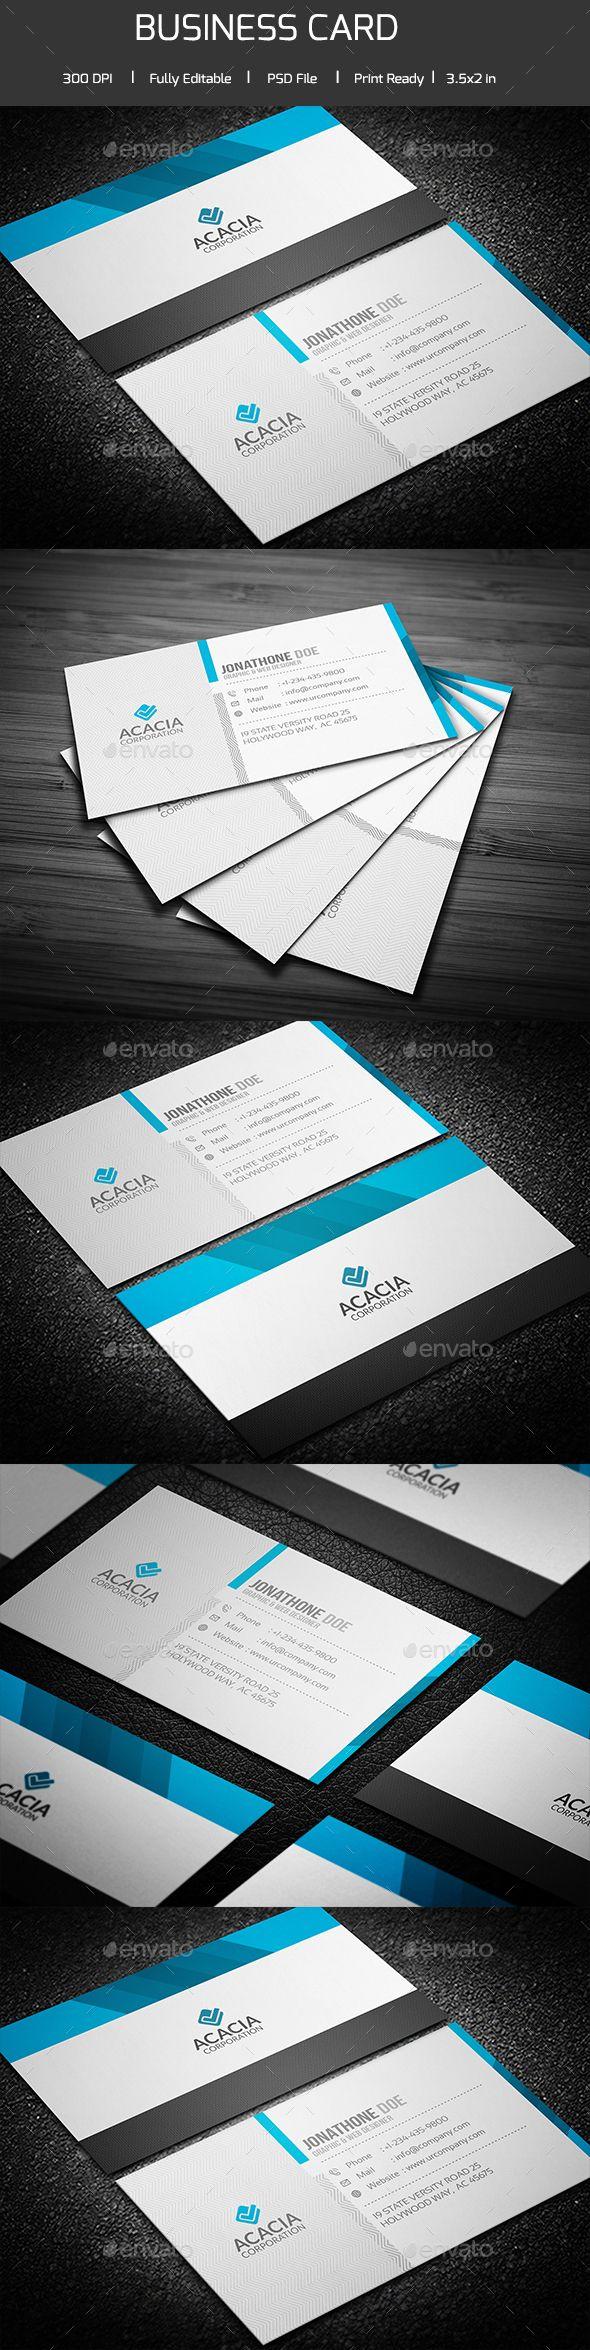 2207 best Дизайн, Визитки images on Pinterest | Business cards ...